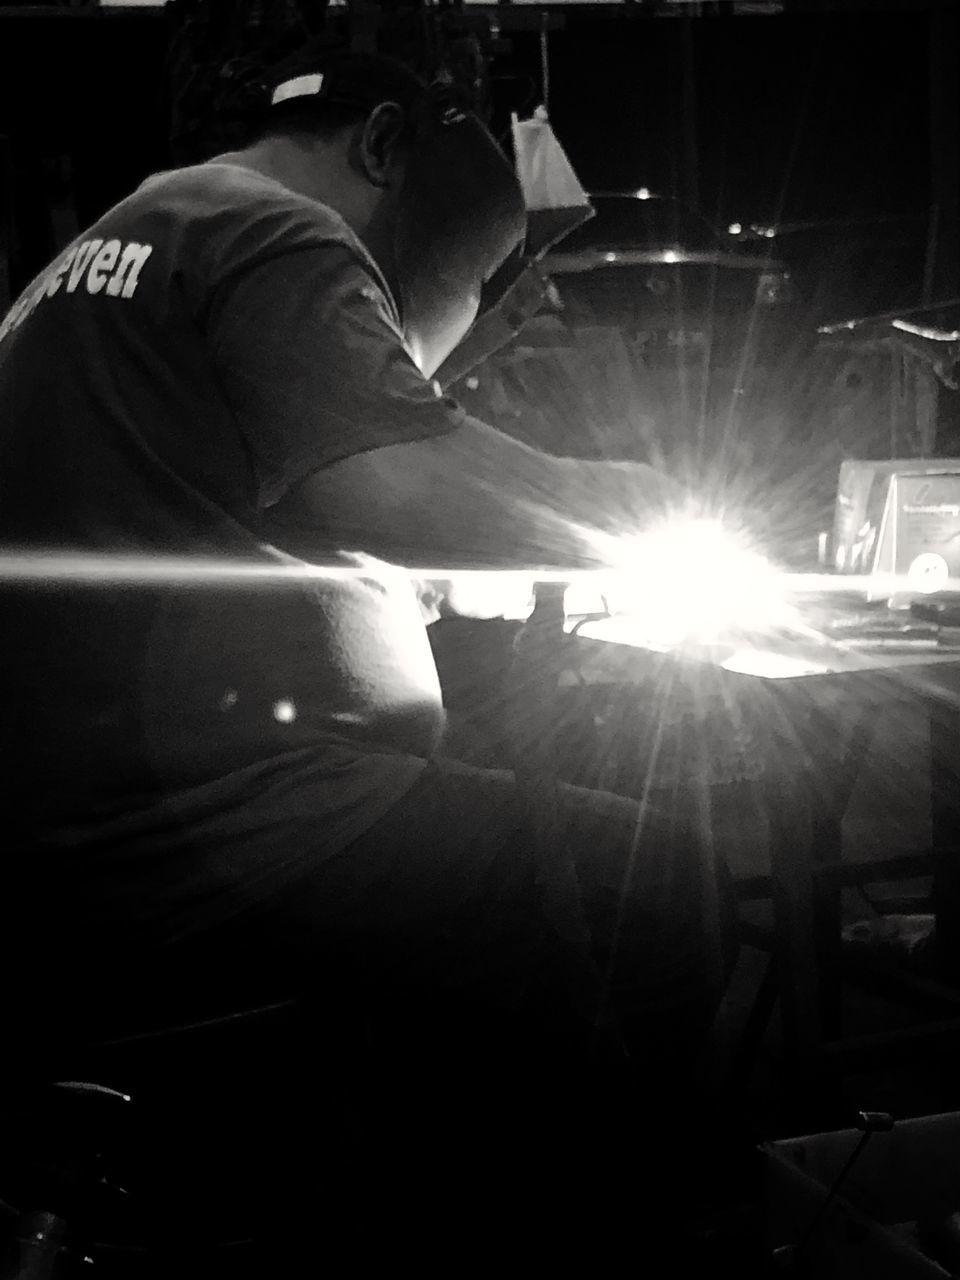 PEOPLE WORKING IN ILLUMINATED LIGHTS